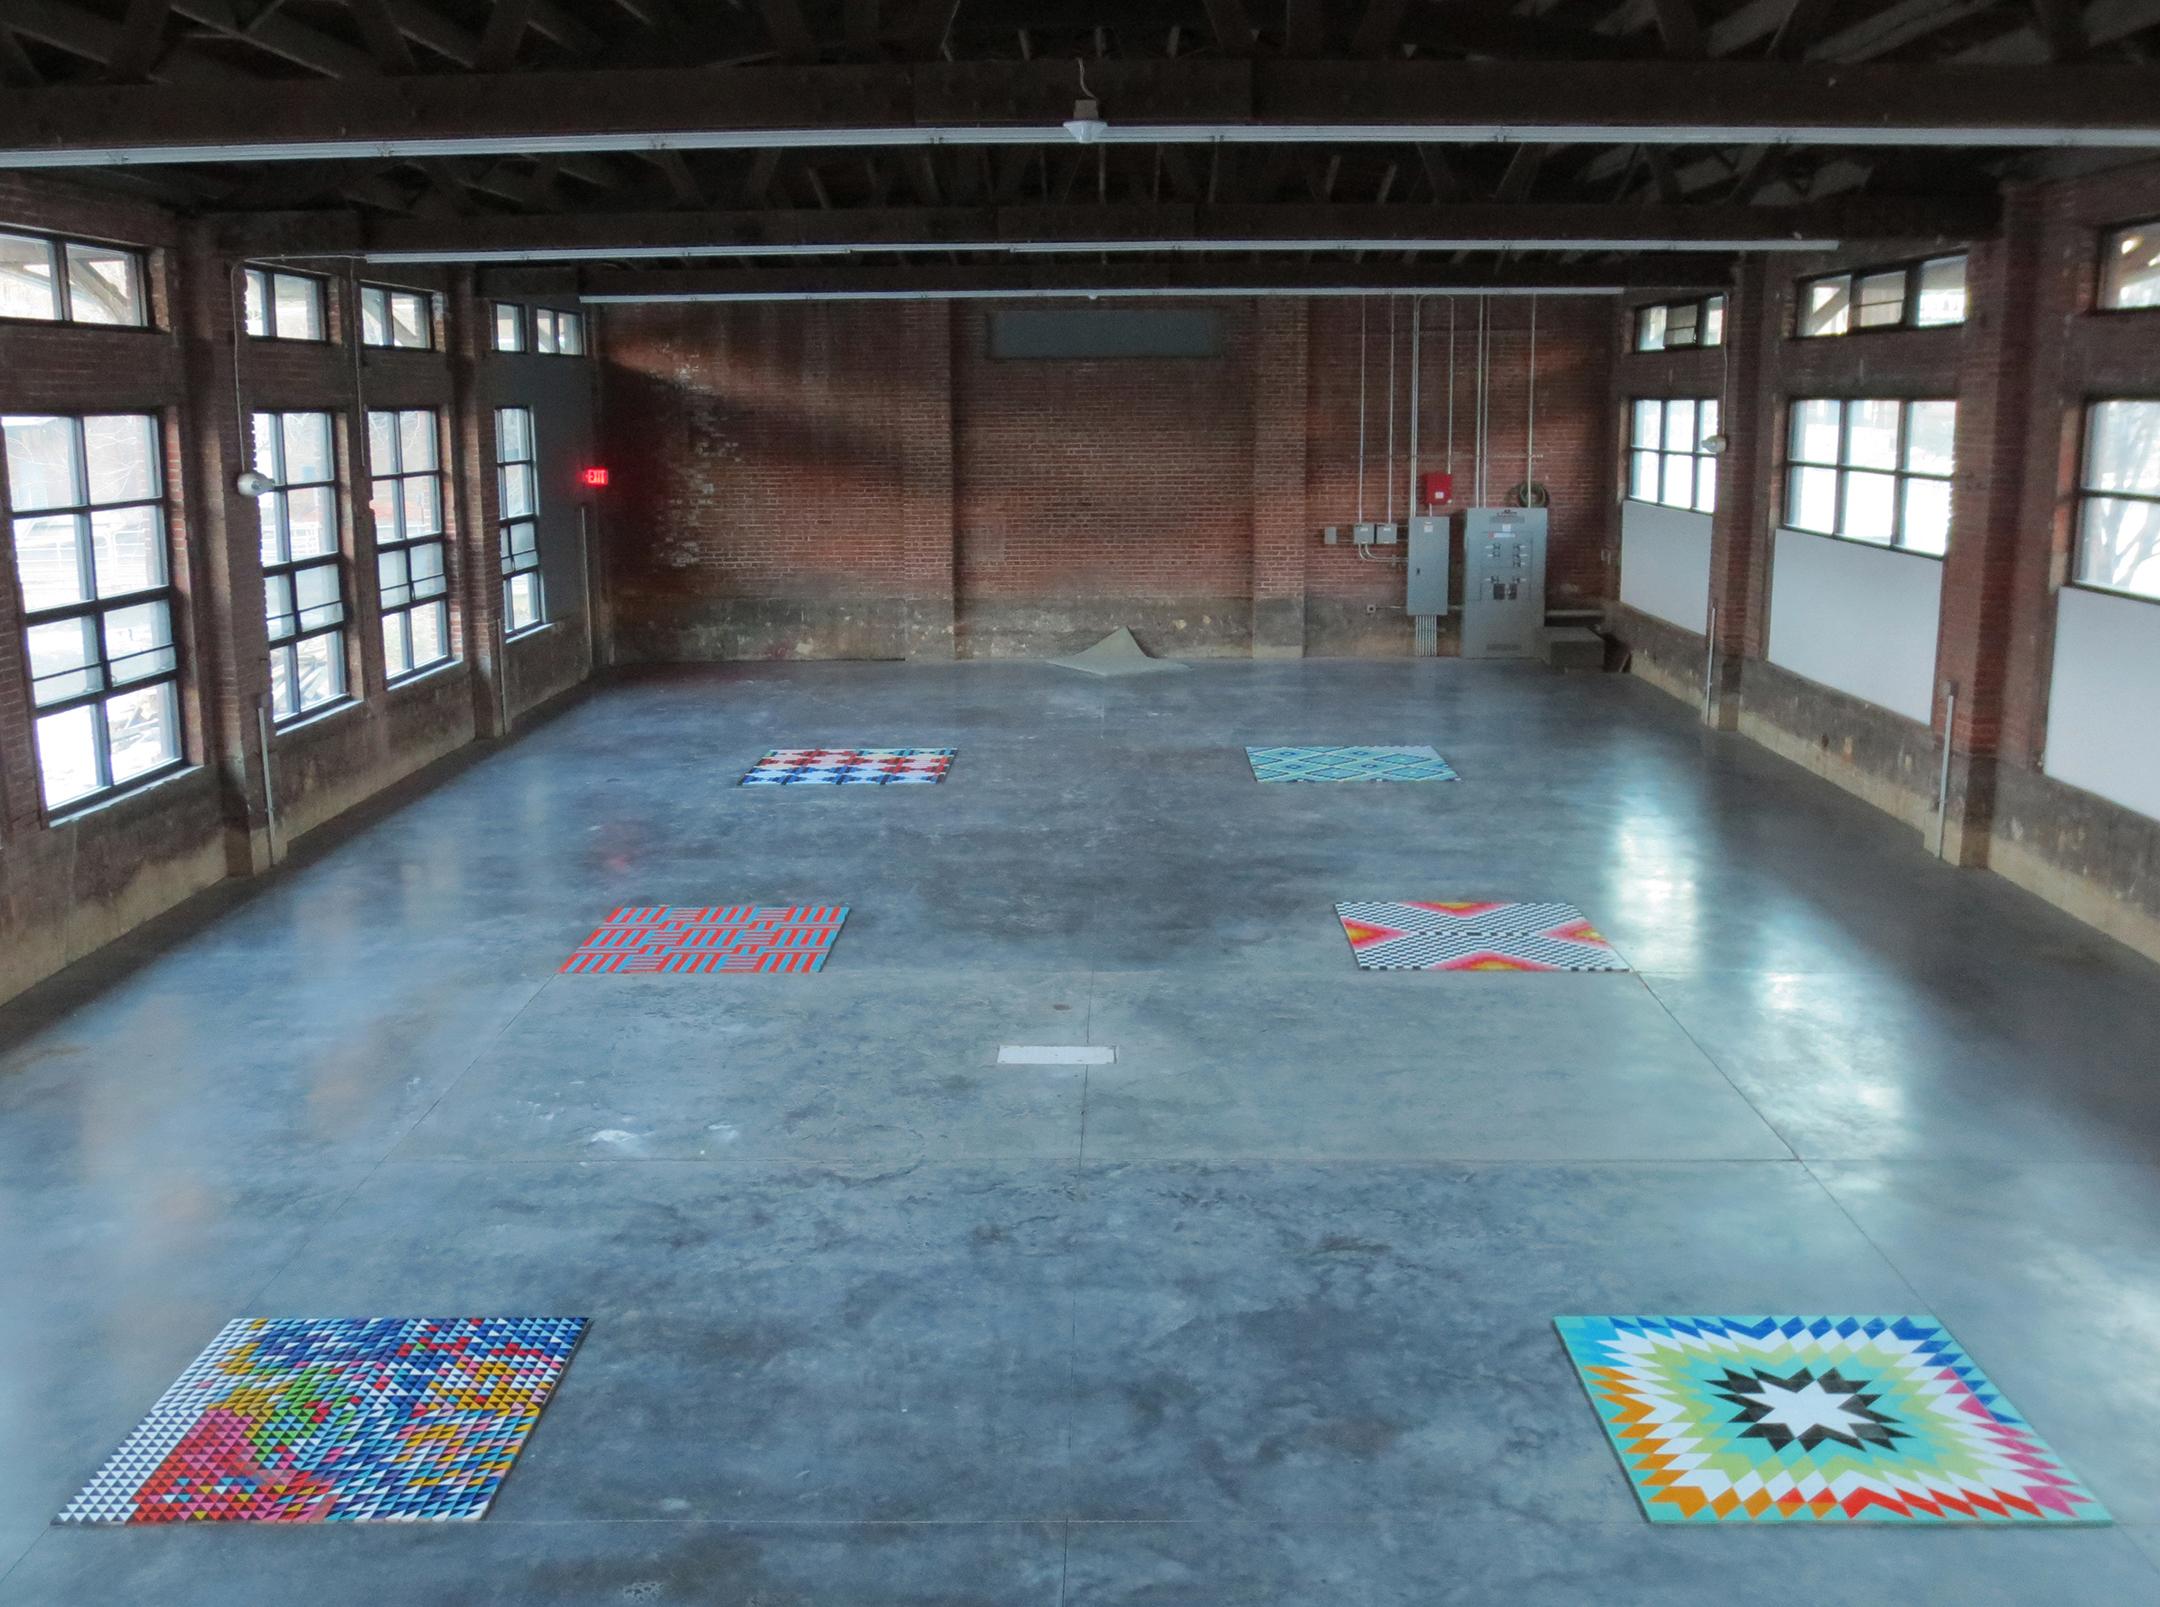 Tiles Installation, 2013, Okada Sculpture Facility, Bemis Center for Contemporary Art, Omaha, NE, Courtesy of the artist.